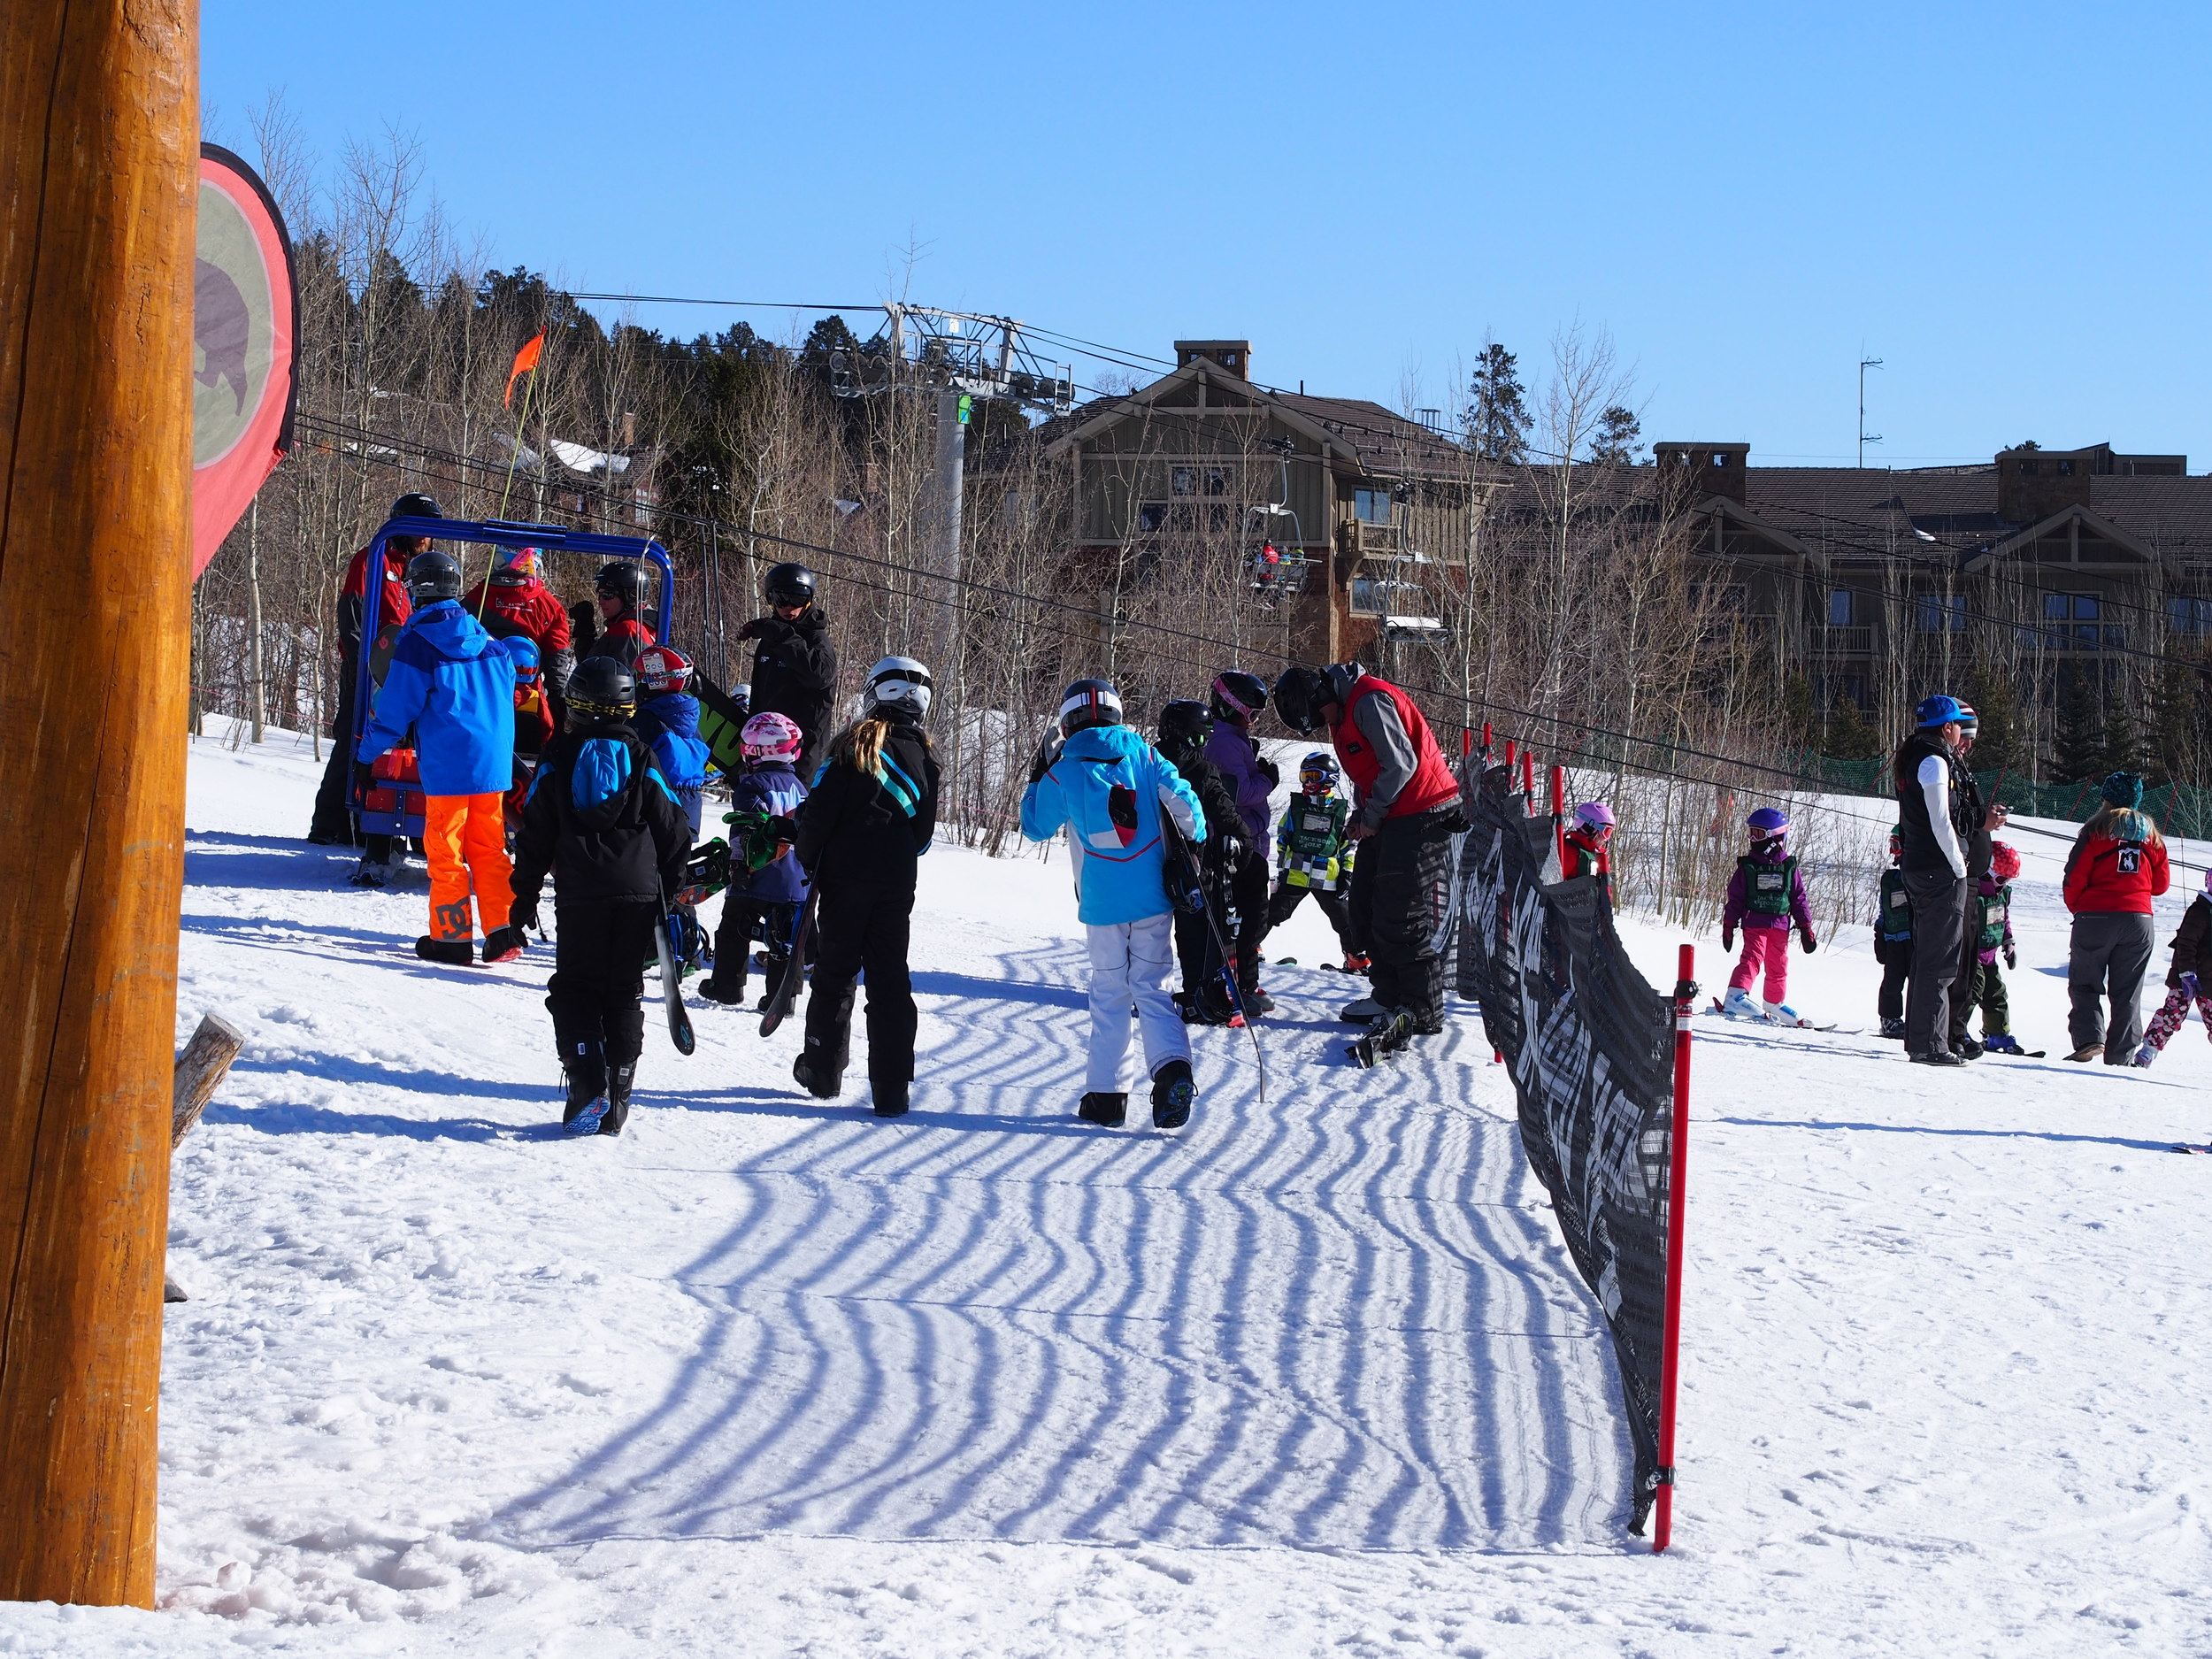 Kids Ranch Ski School in Jackson Hole